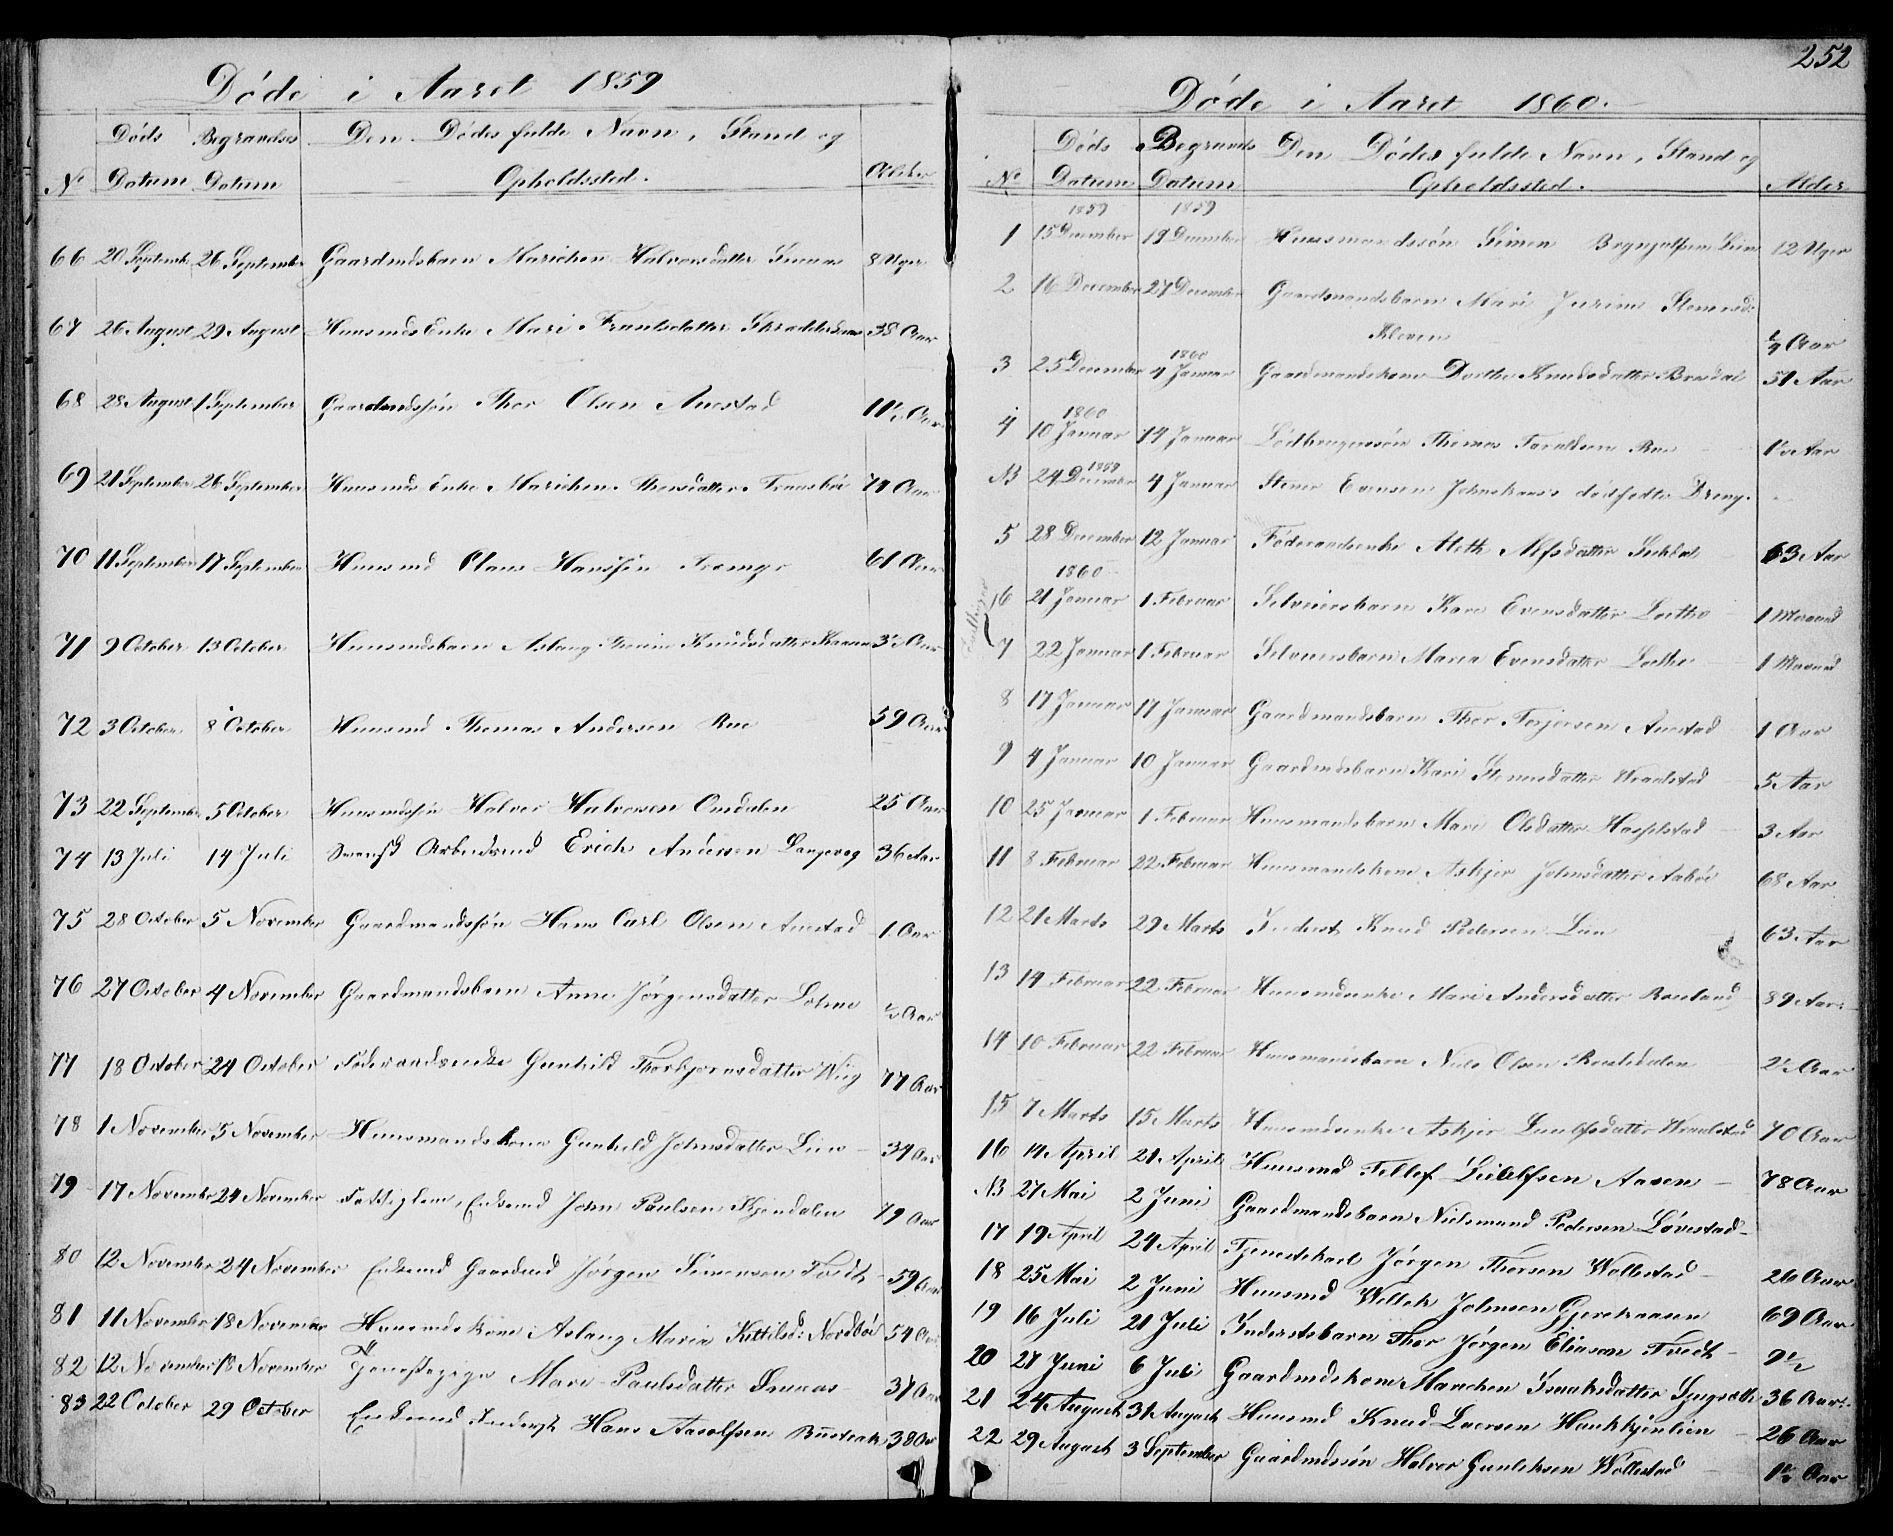 SAKO, Drangedal kirkebøker, G/Gb/L0001: Klokkerbok nr. II 1, 1856-1894, s. 252